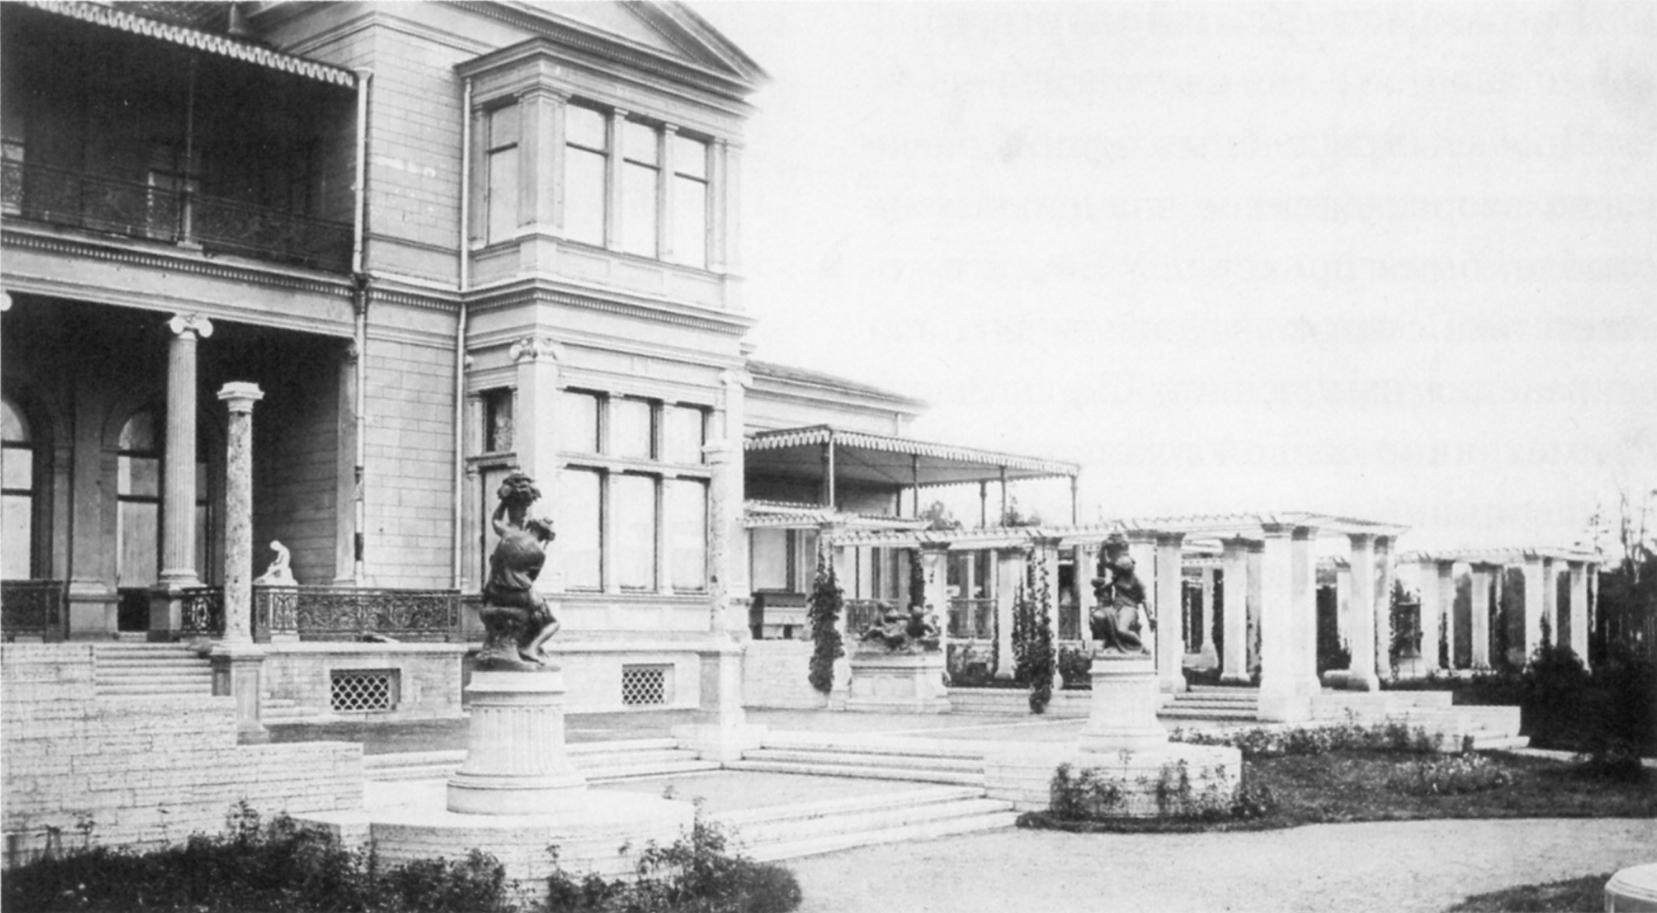 Терраса перед Гостиной Большого дворца. 1862